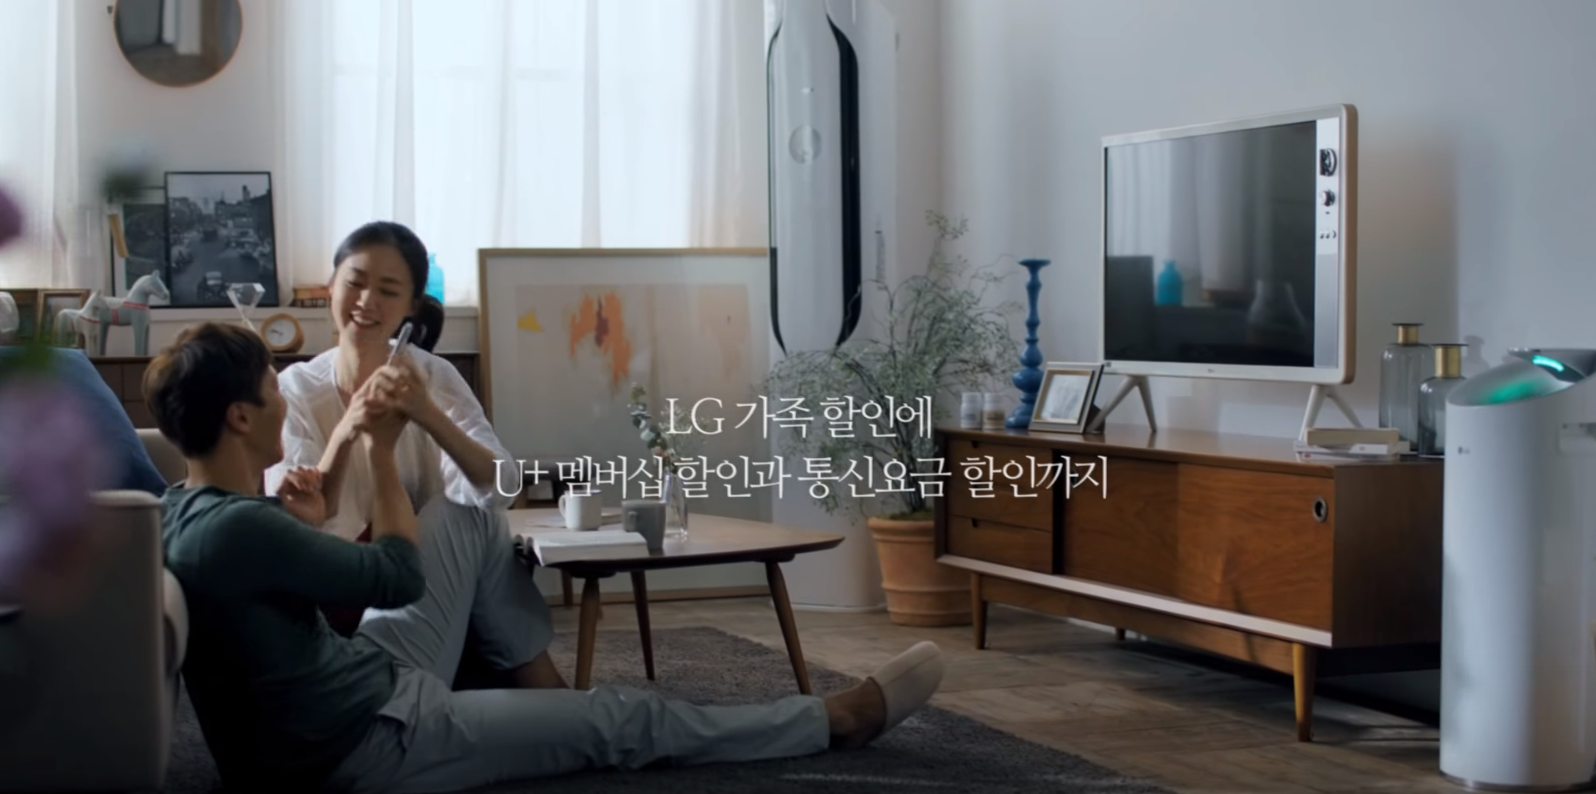 LG유플러스, LG유플러스 멤버쉽, 통신비 할인, LG 패밀리샵, 패밀리샵, IT, 리뷰, 이슈, 스마트폰, 모바일, LGU PLUS